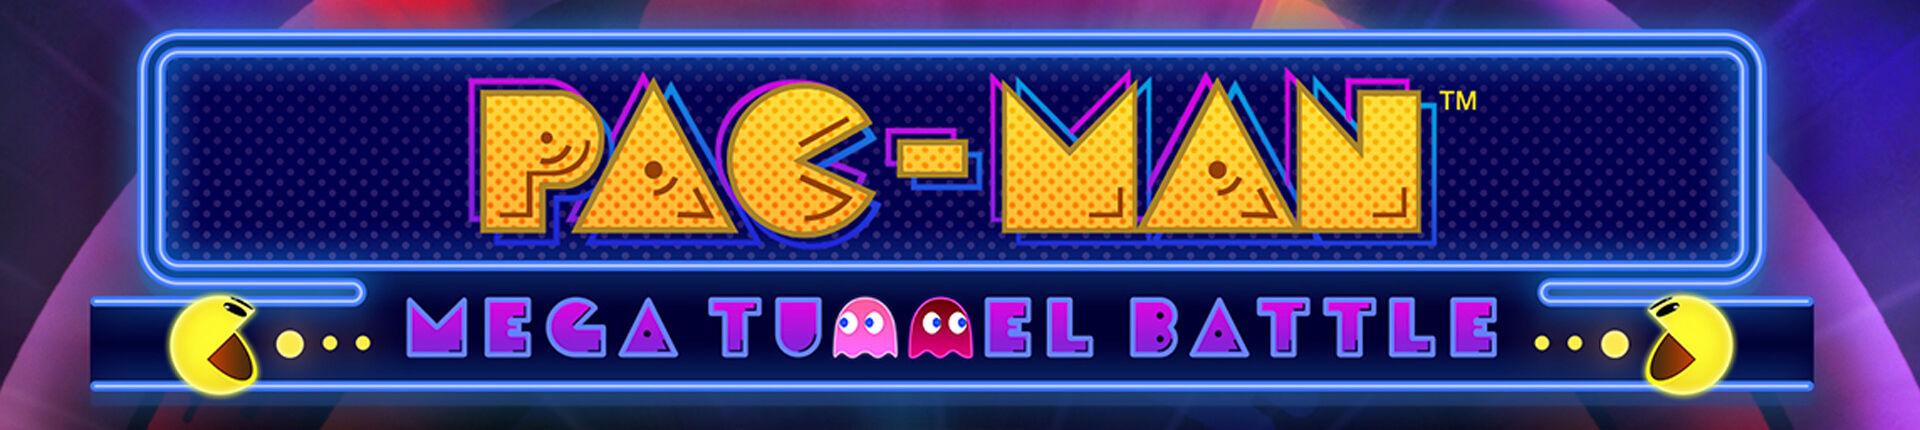 <a href='https://www.mightygamesmag.de/all-game-list/pac-man-mega-tunnel-battle/'>Zum Spiel</a>